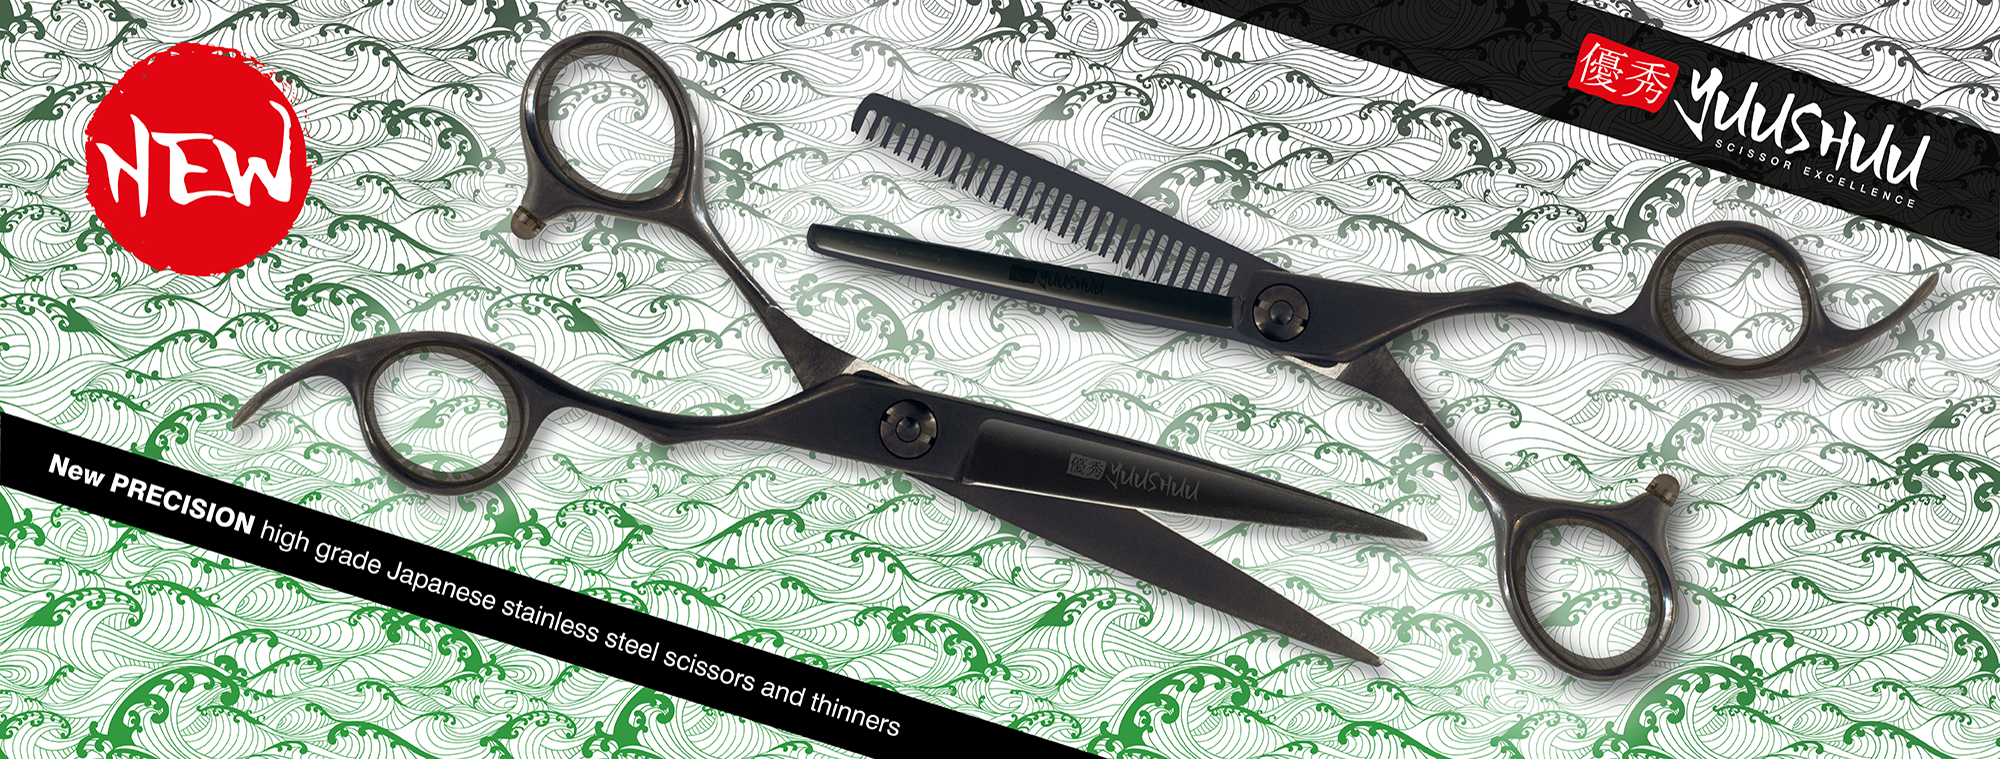 Yuushuu Precision Scissor